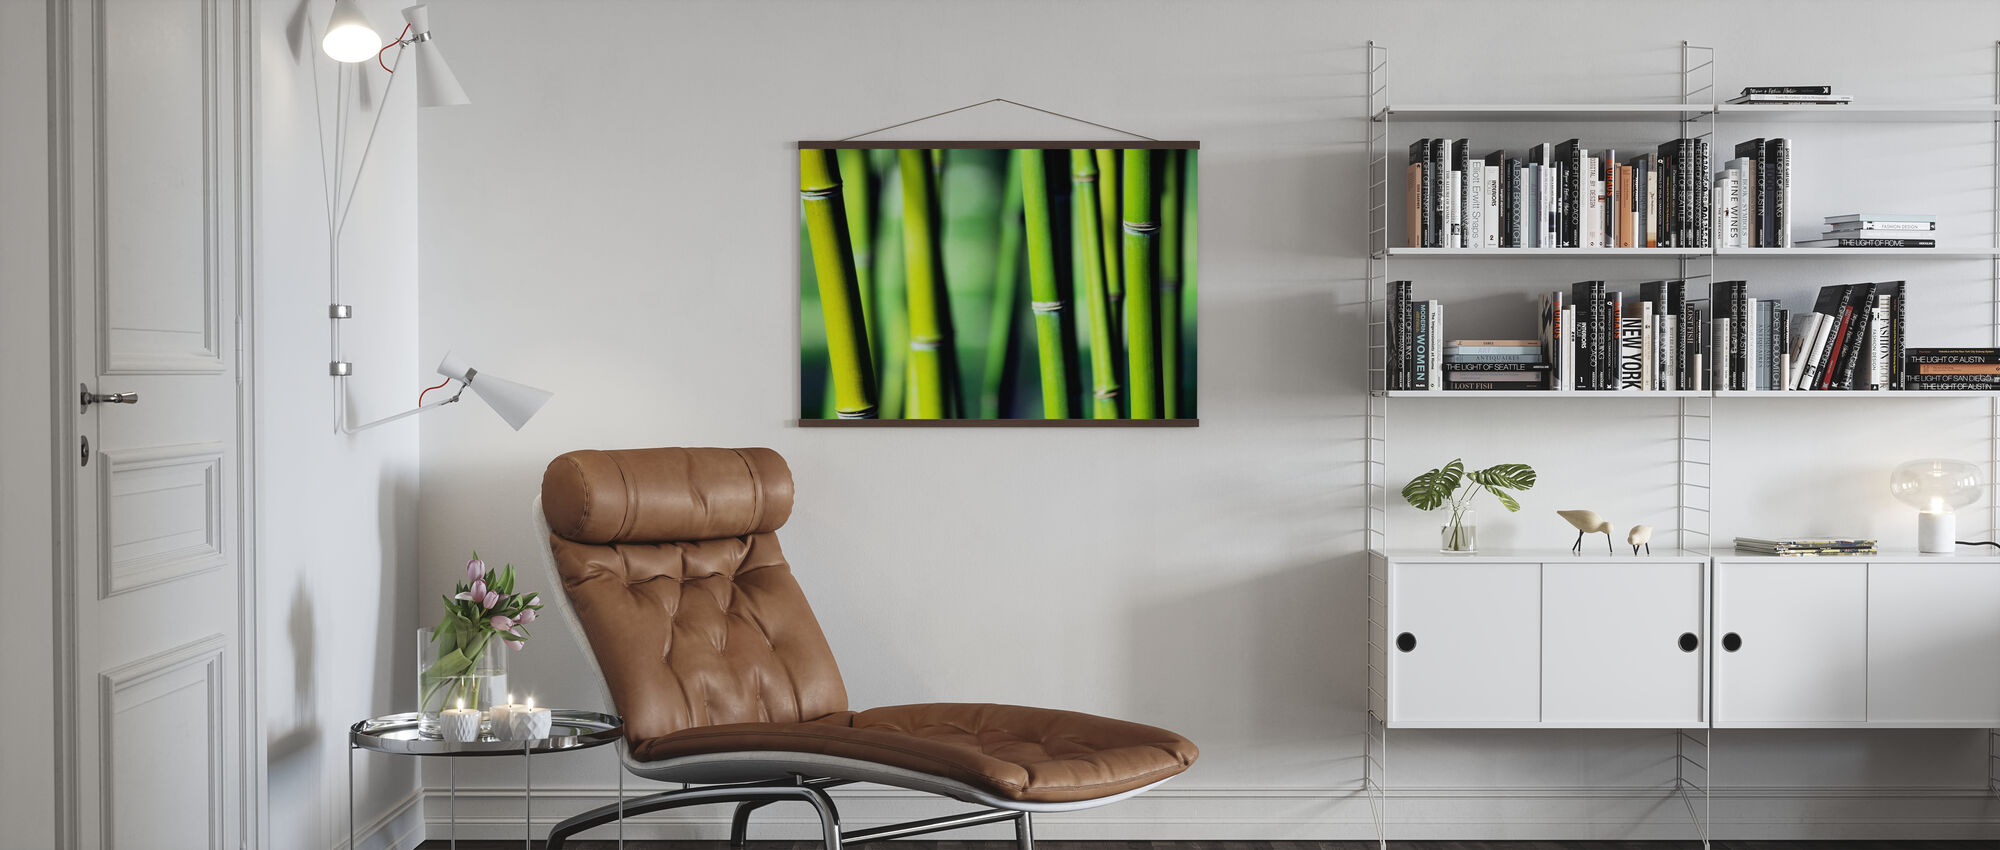 Evergreen - Plakat - Stue